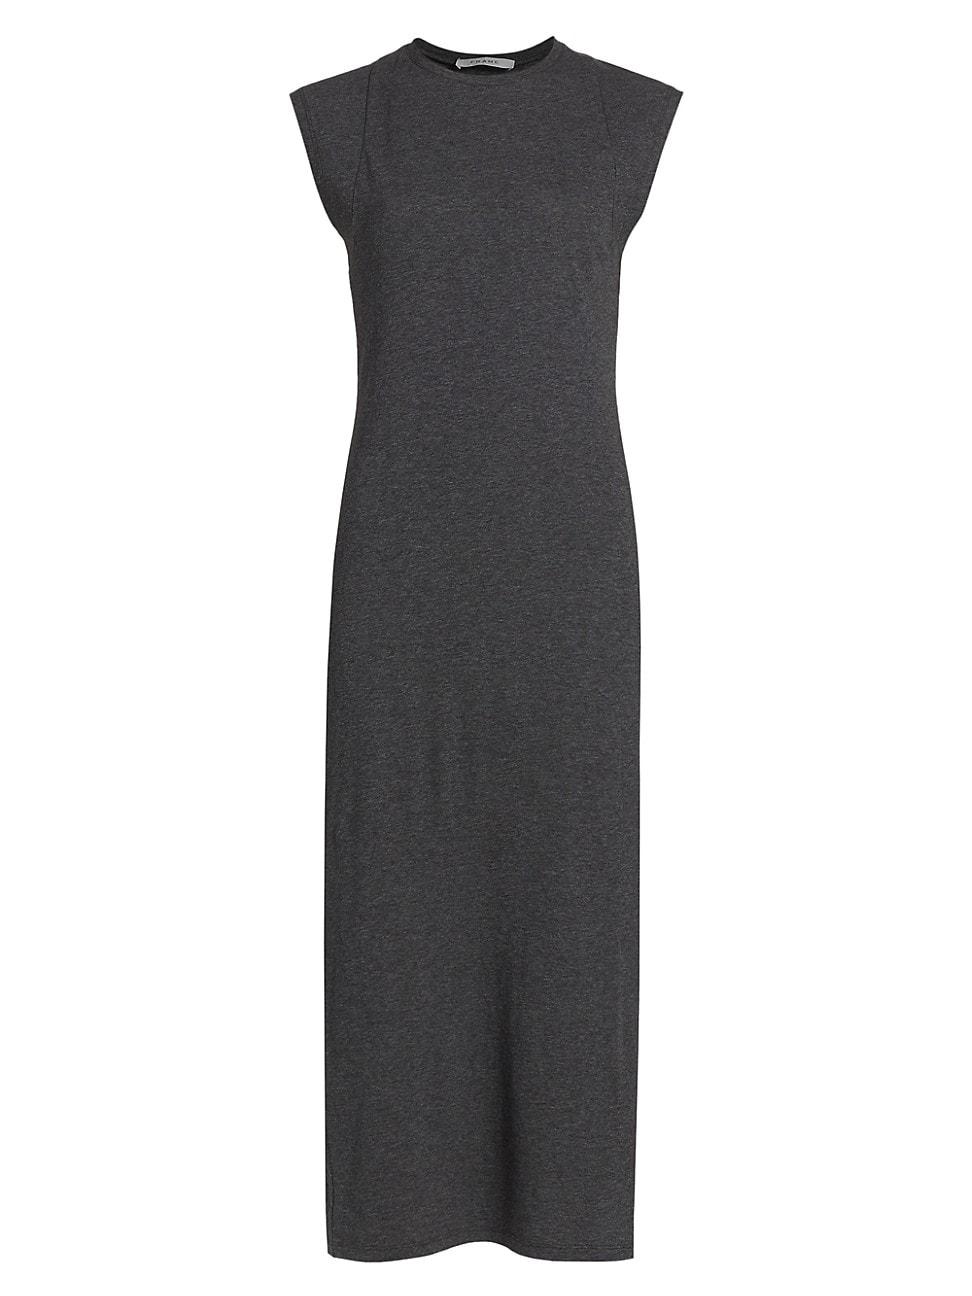 Frame Cottons WOMEN'S LE MUSCLE MAXI DRESS